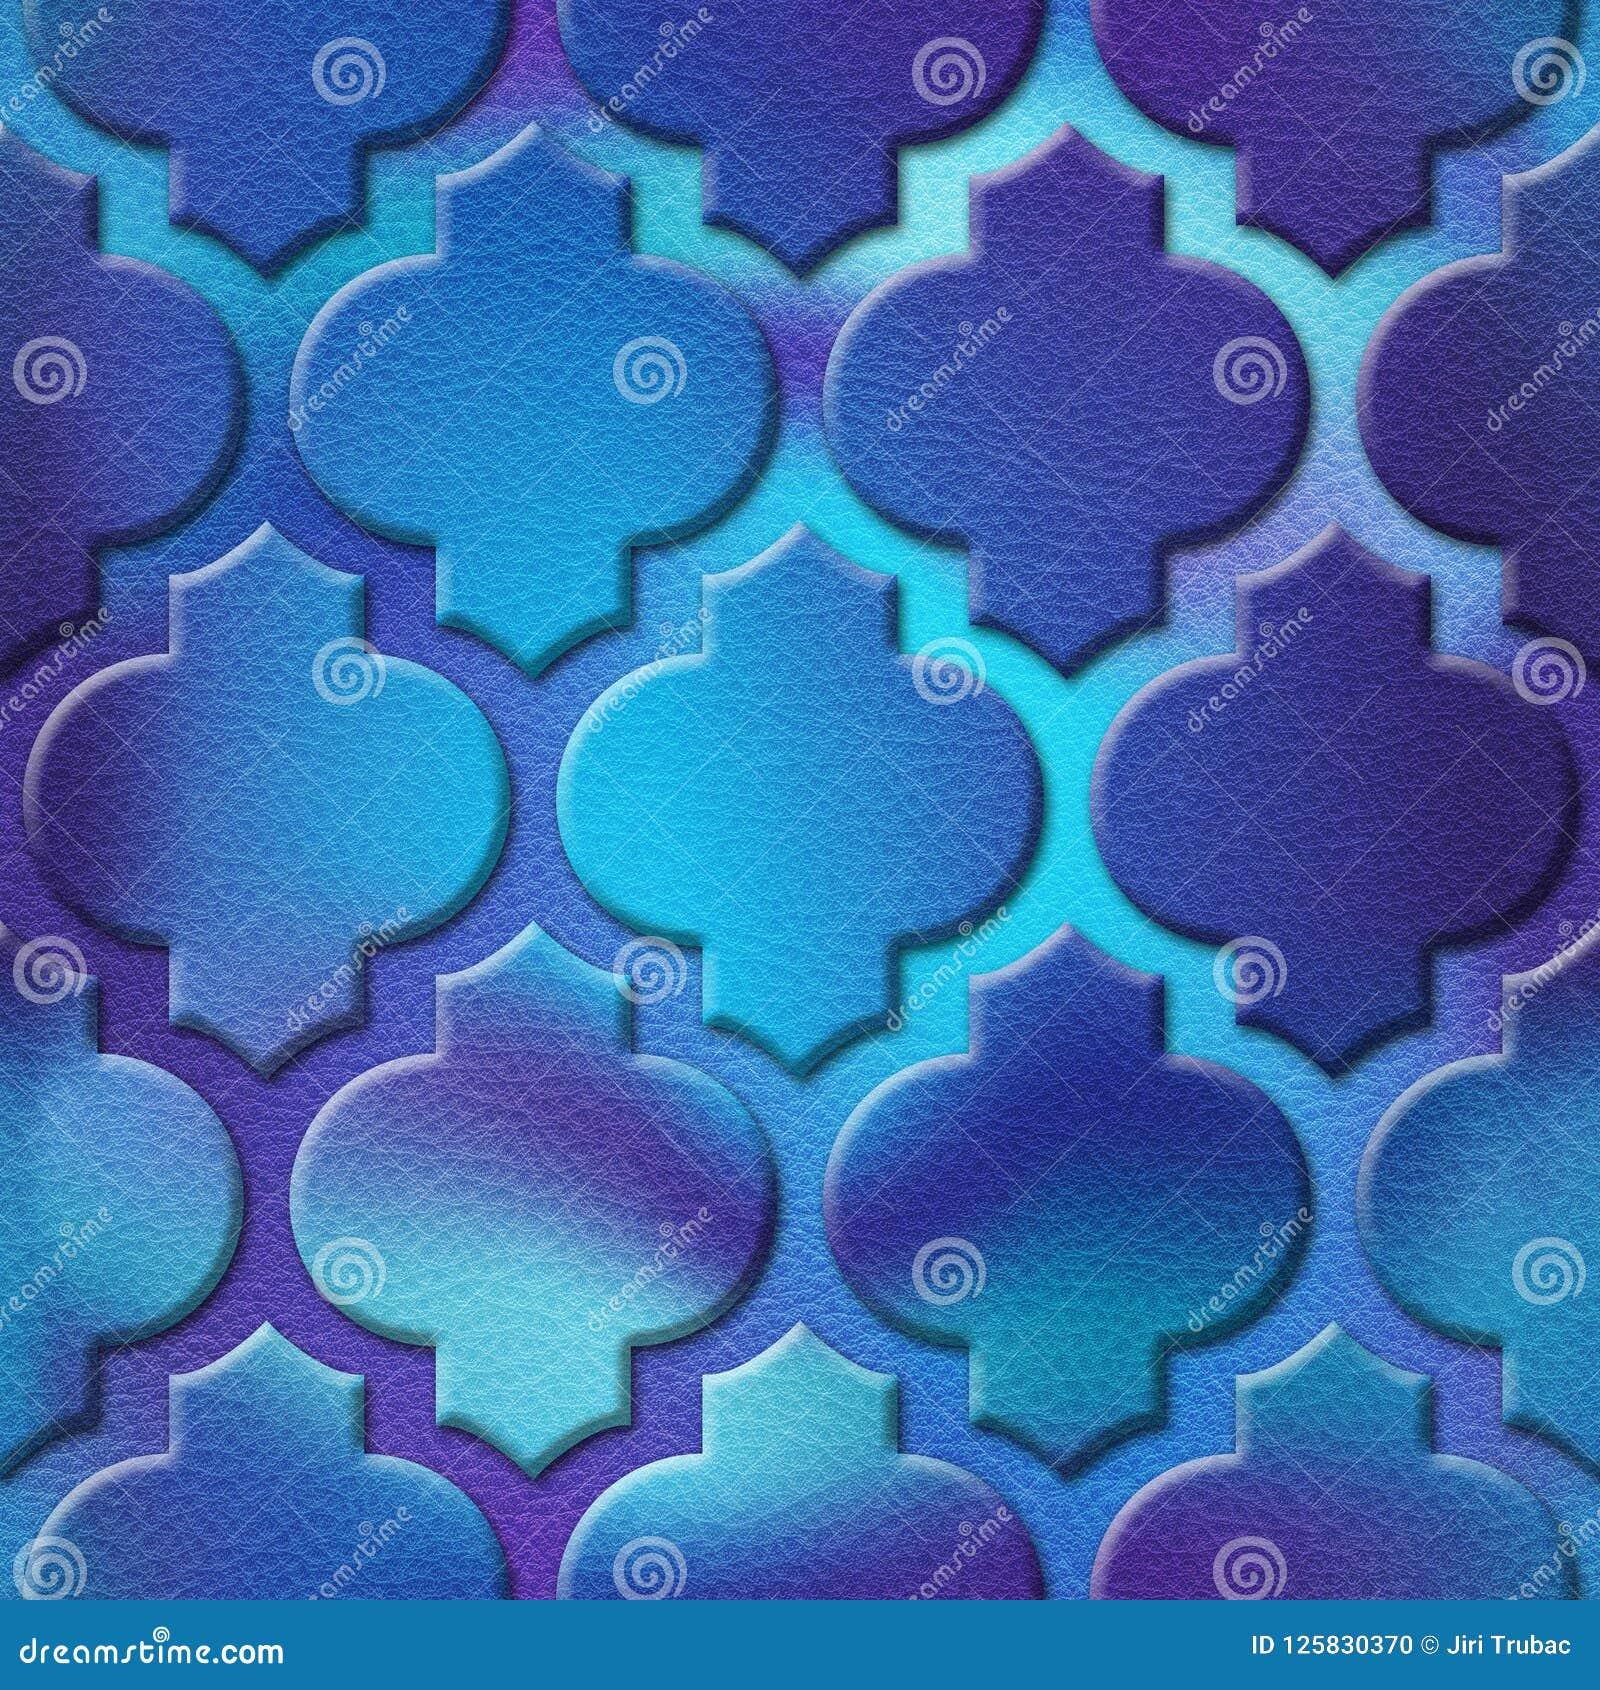 Innenwandmuster - abstraktes Dekorationsmaterial - arabischer Dekor - geometrische Muster